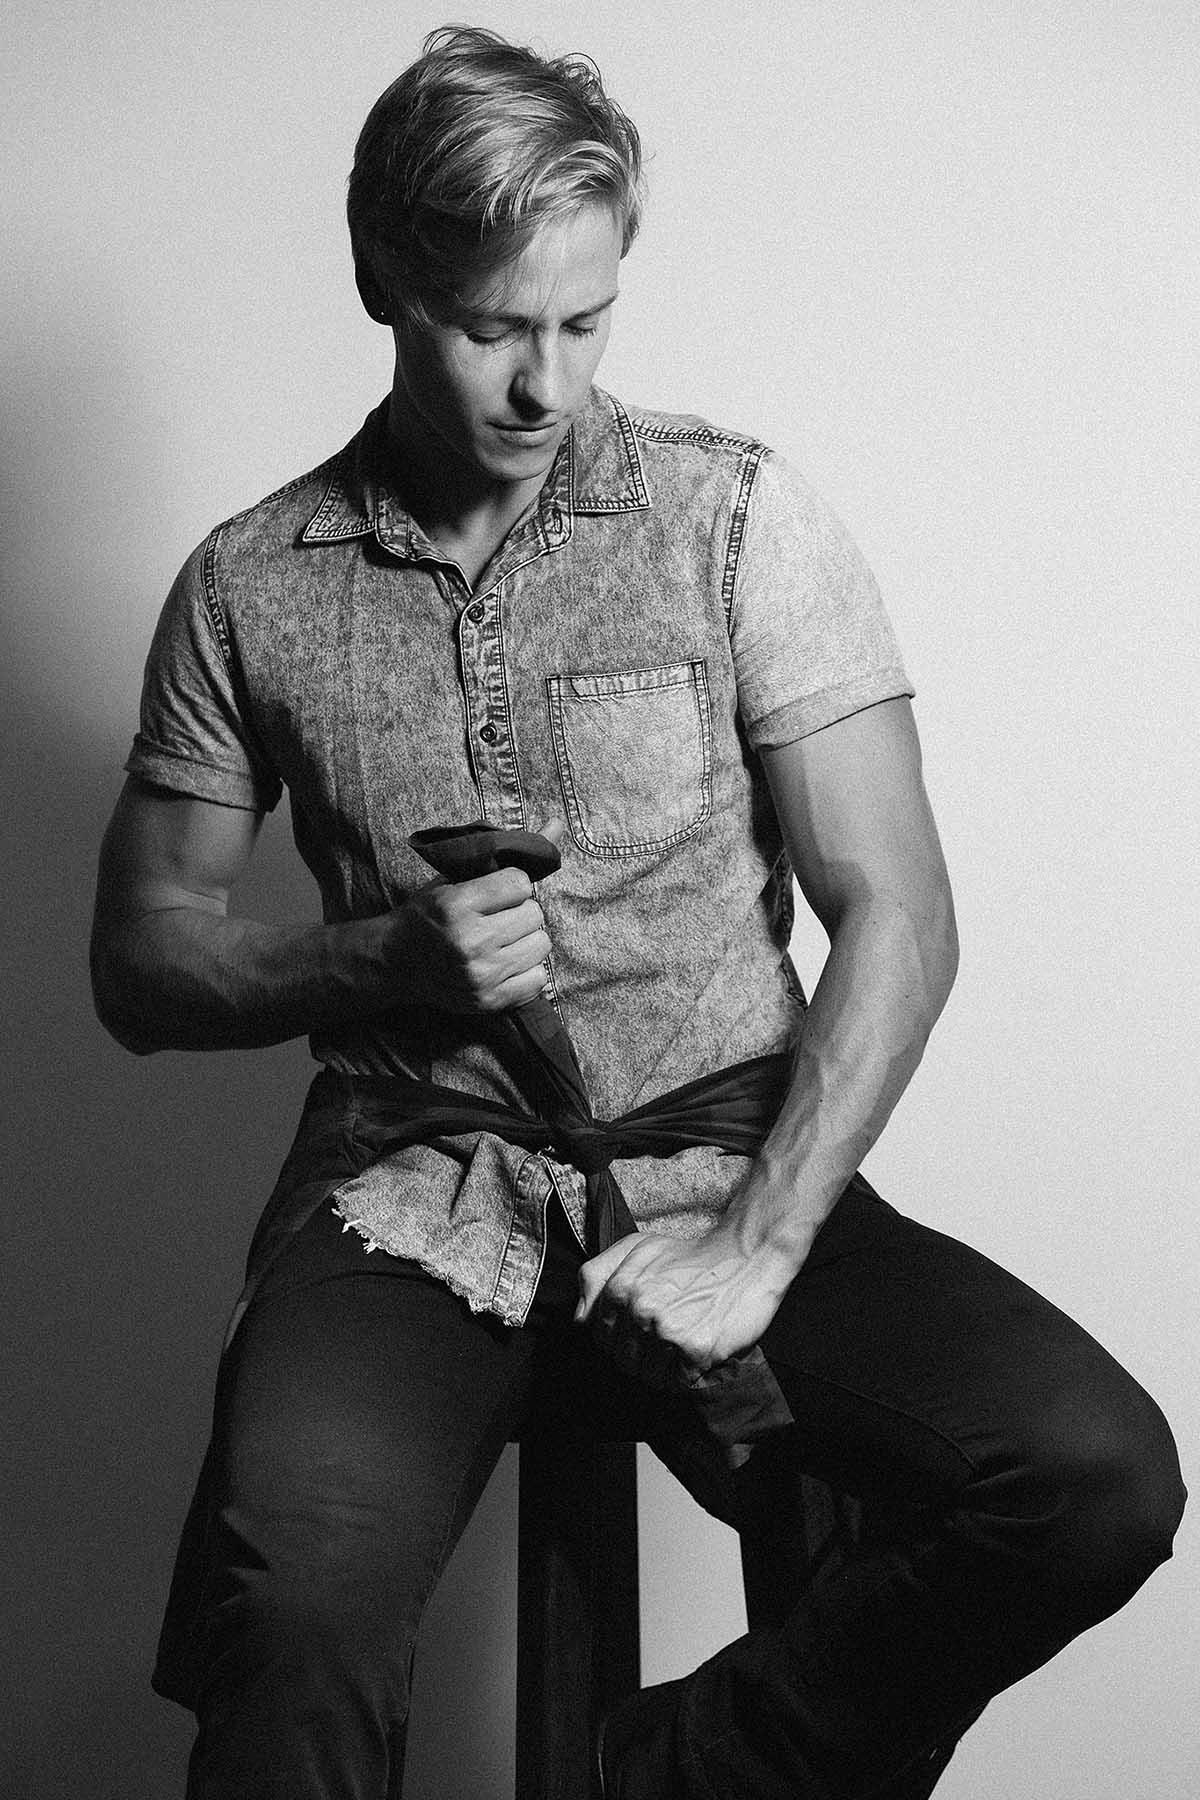 Tiago Faria by Danilo Friedl for Brazilian Male Model